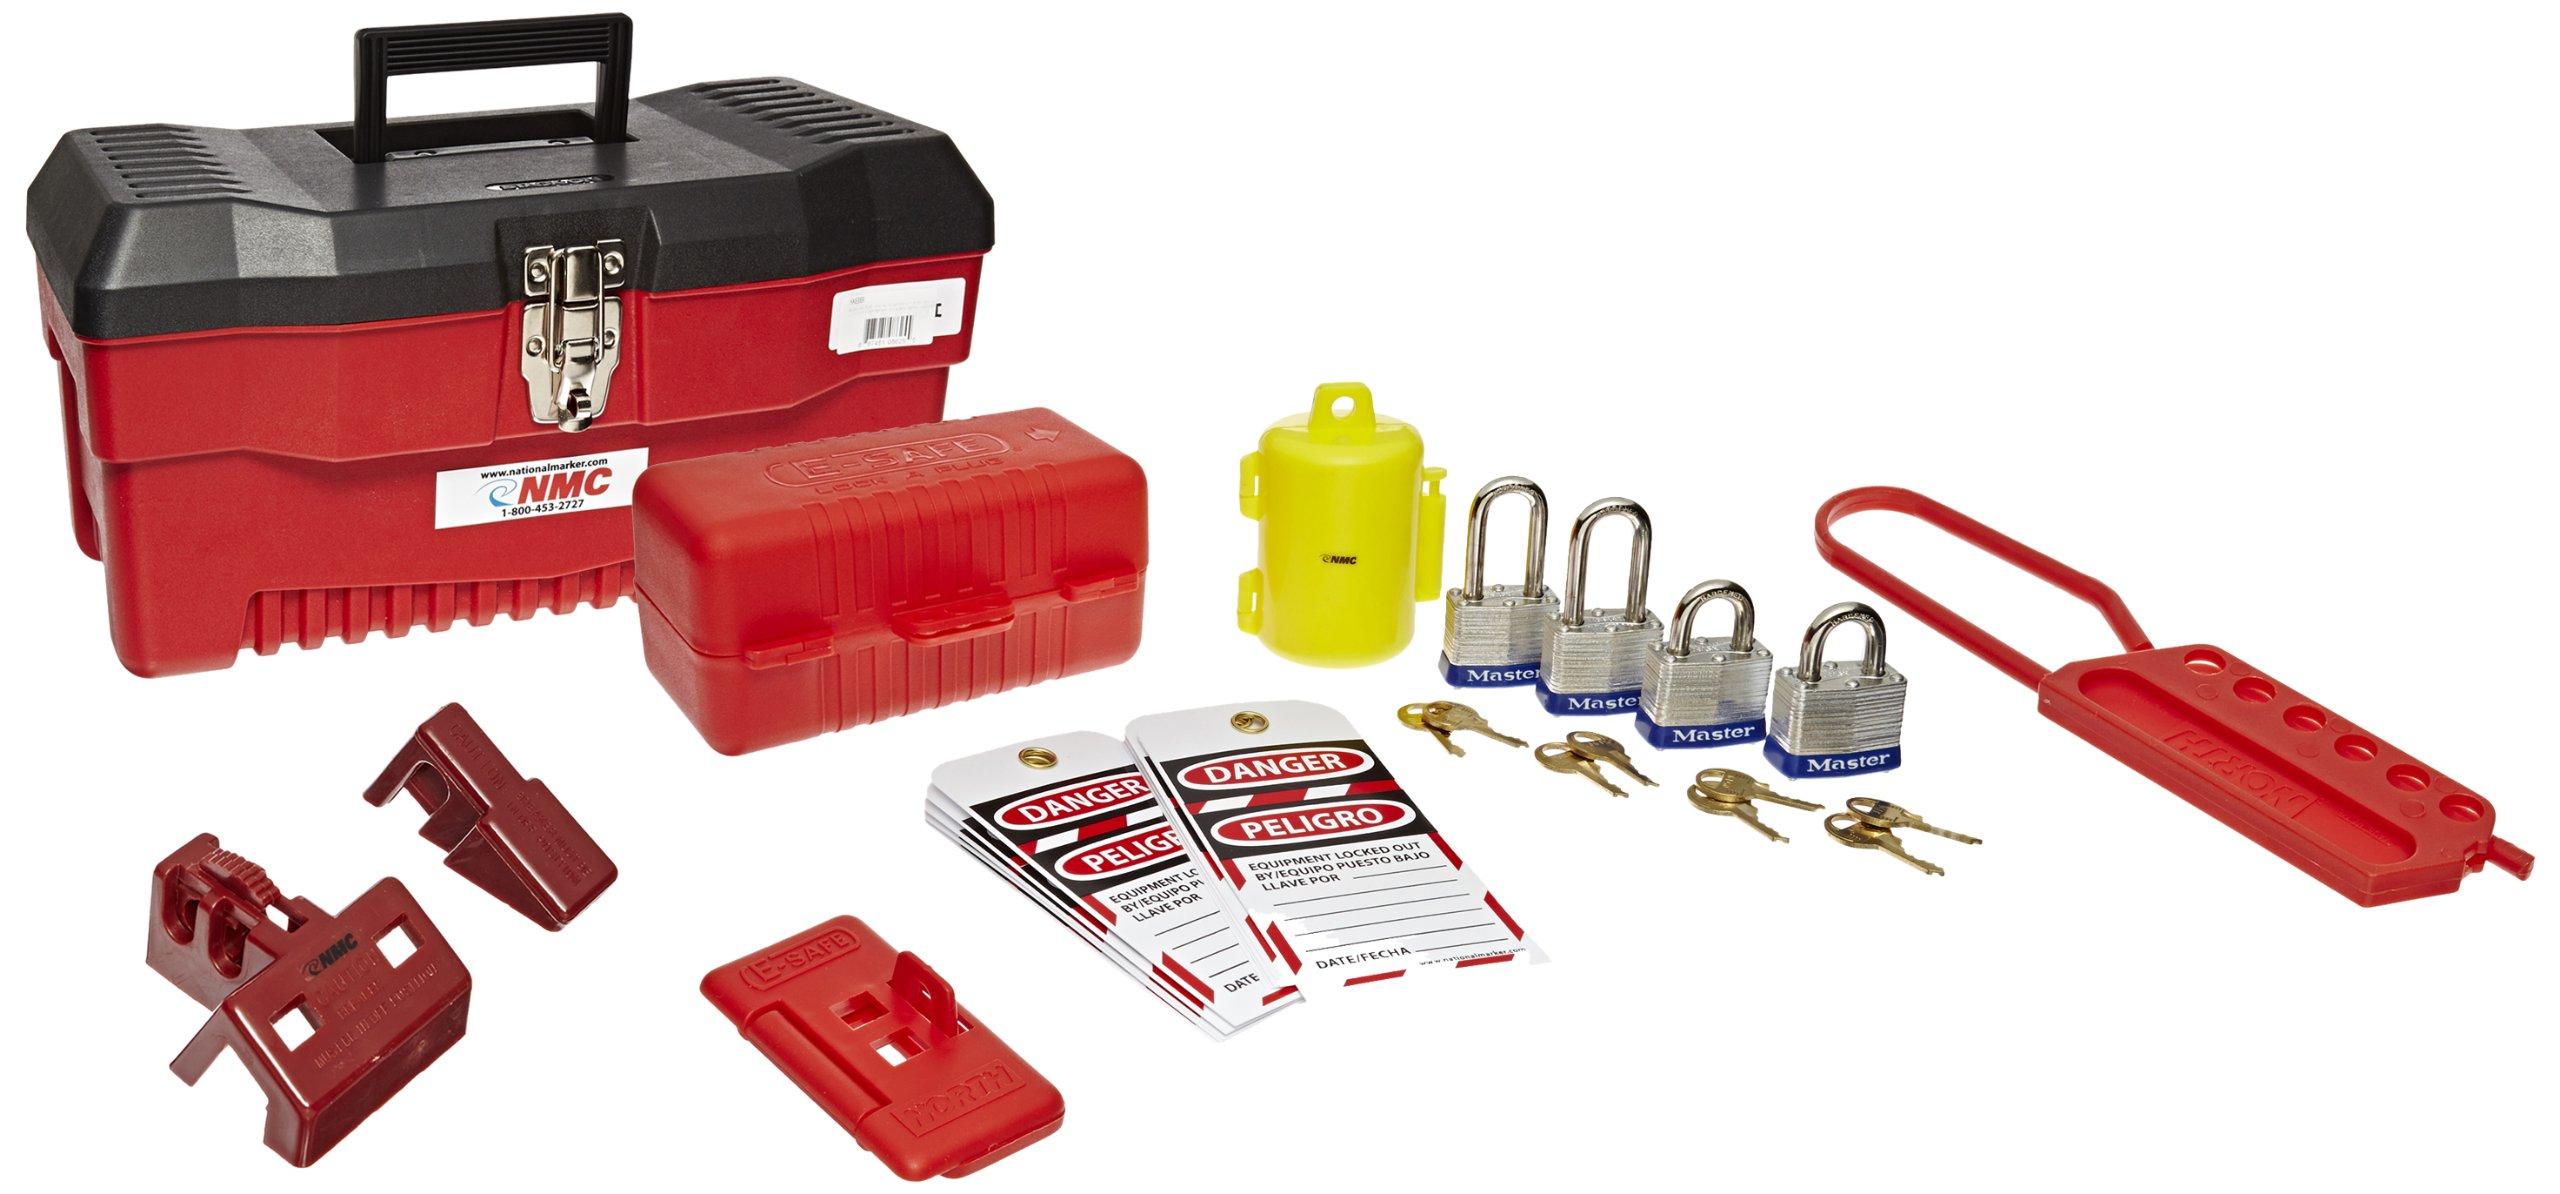 NMC SKEBBI 29 Piece Bilingual Electrical Lockout Starter Kit by NMC (Image #1)